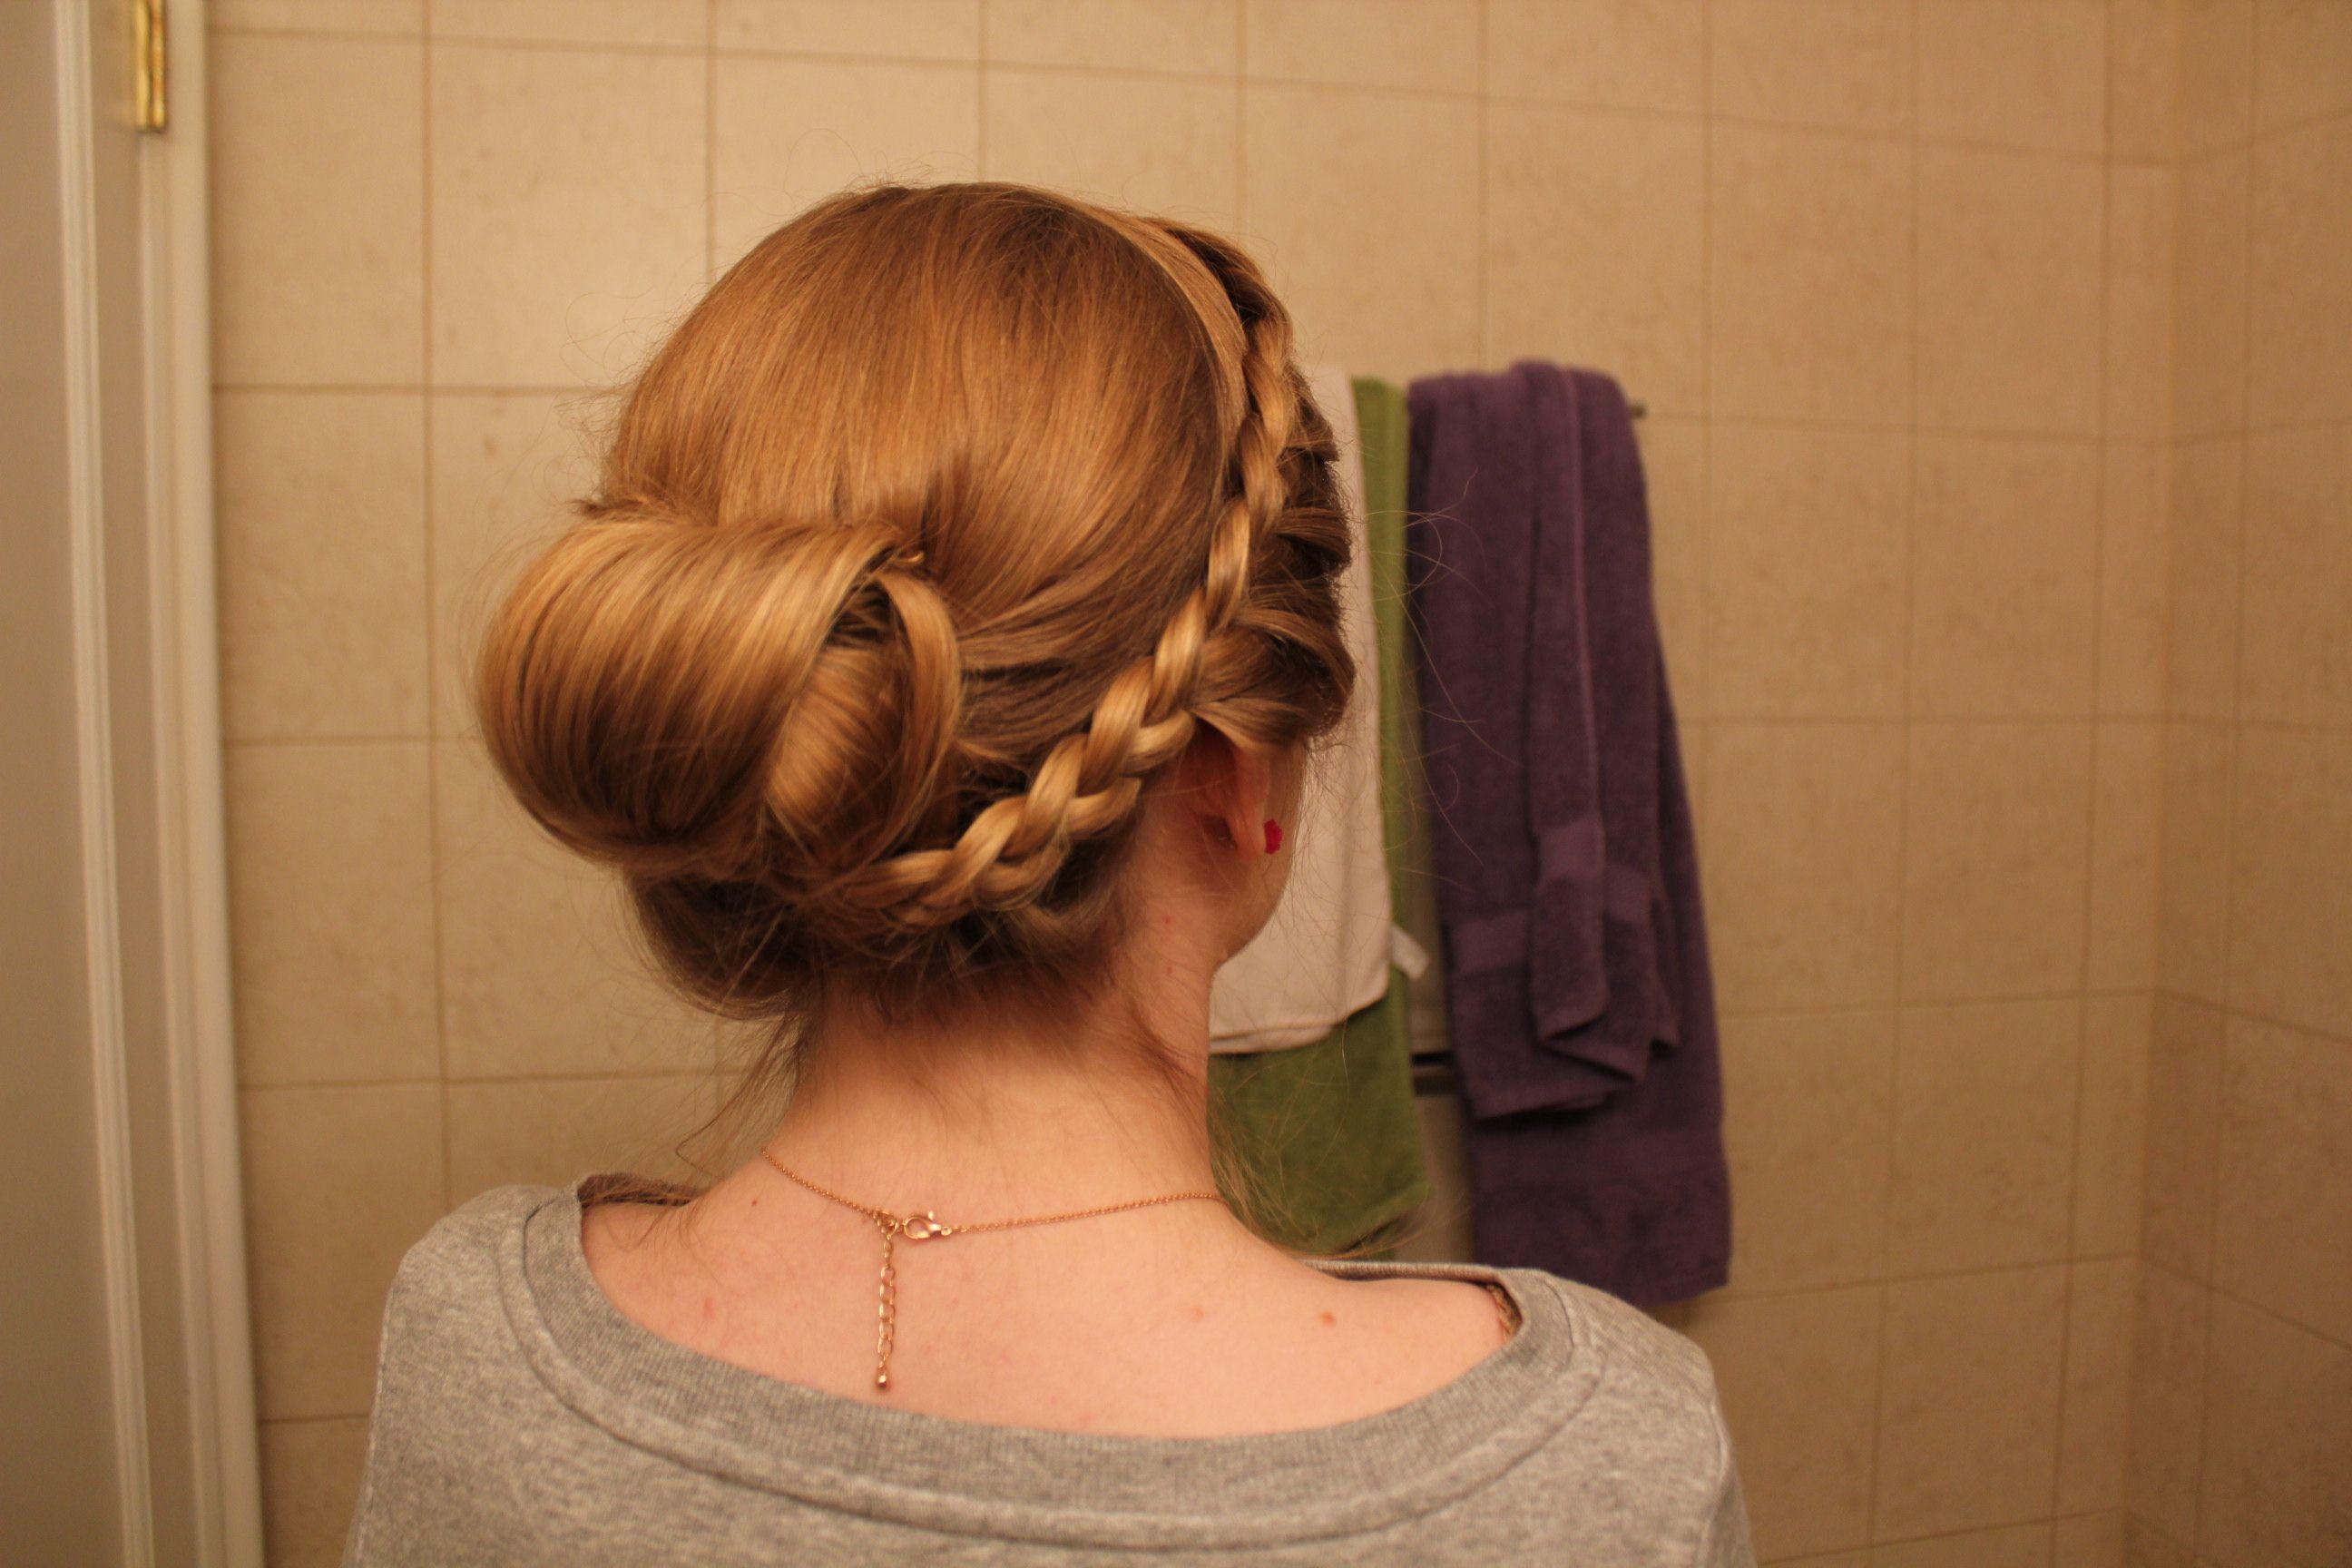 Hair inspired by berenice bejo at the oscars hair pinterest